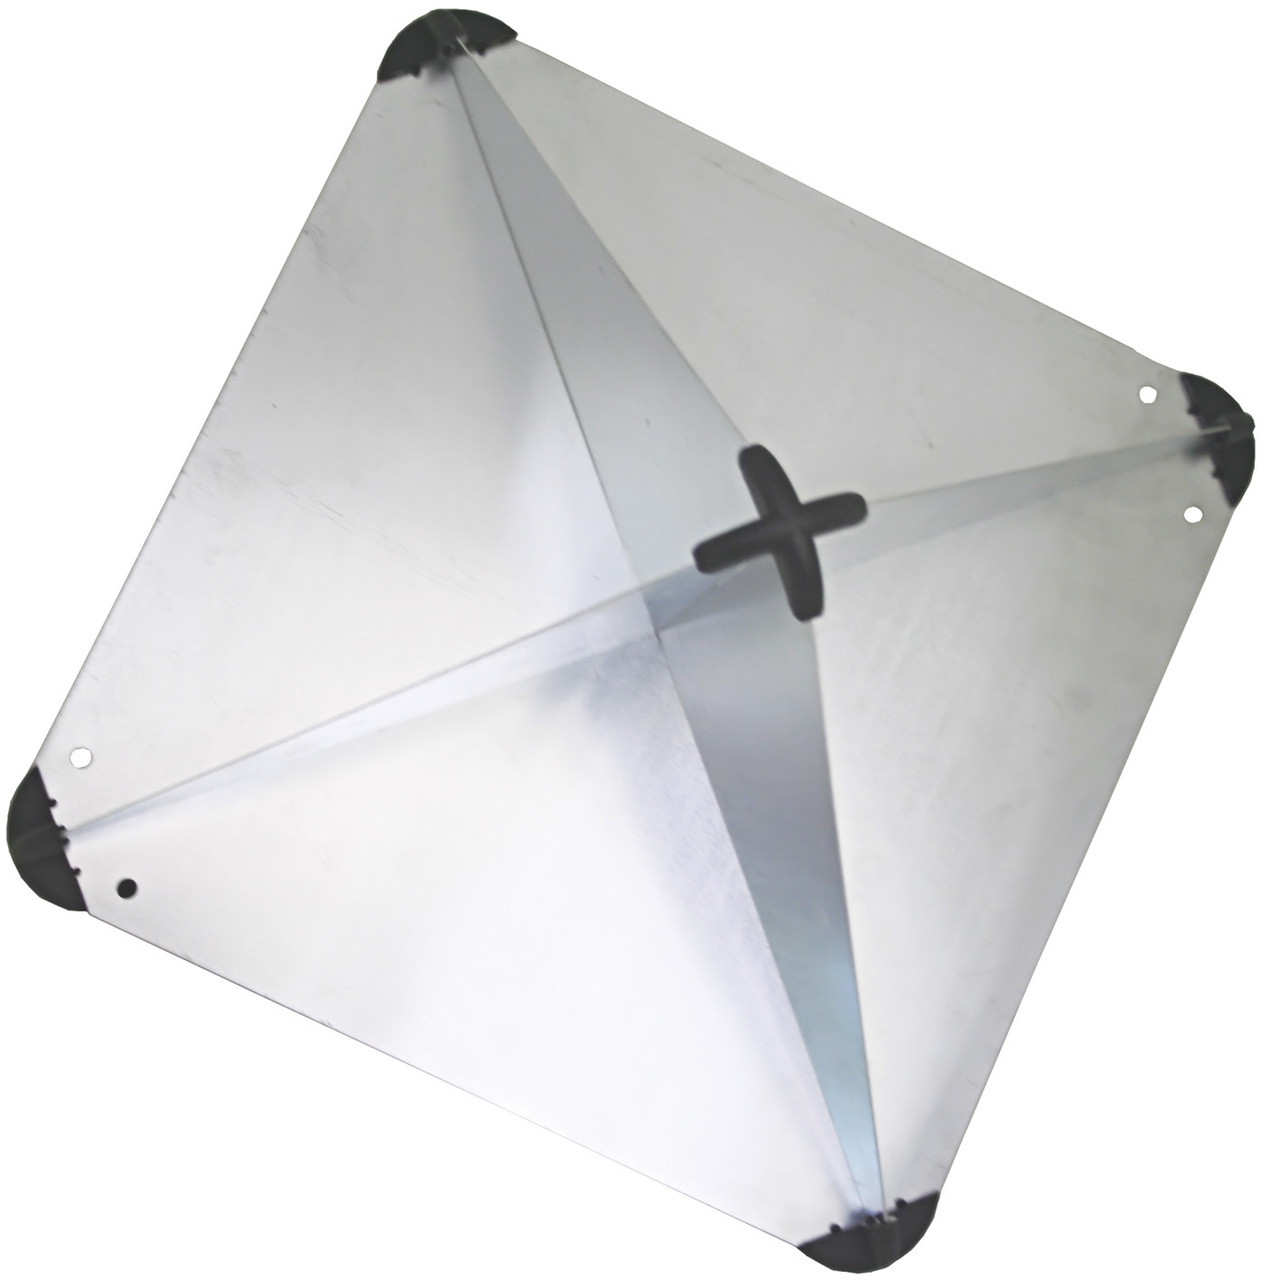 Radar Reflector Lge 460mm